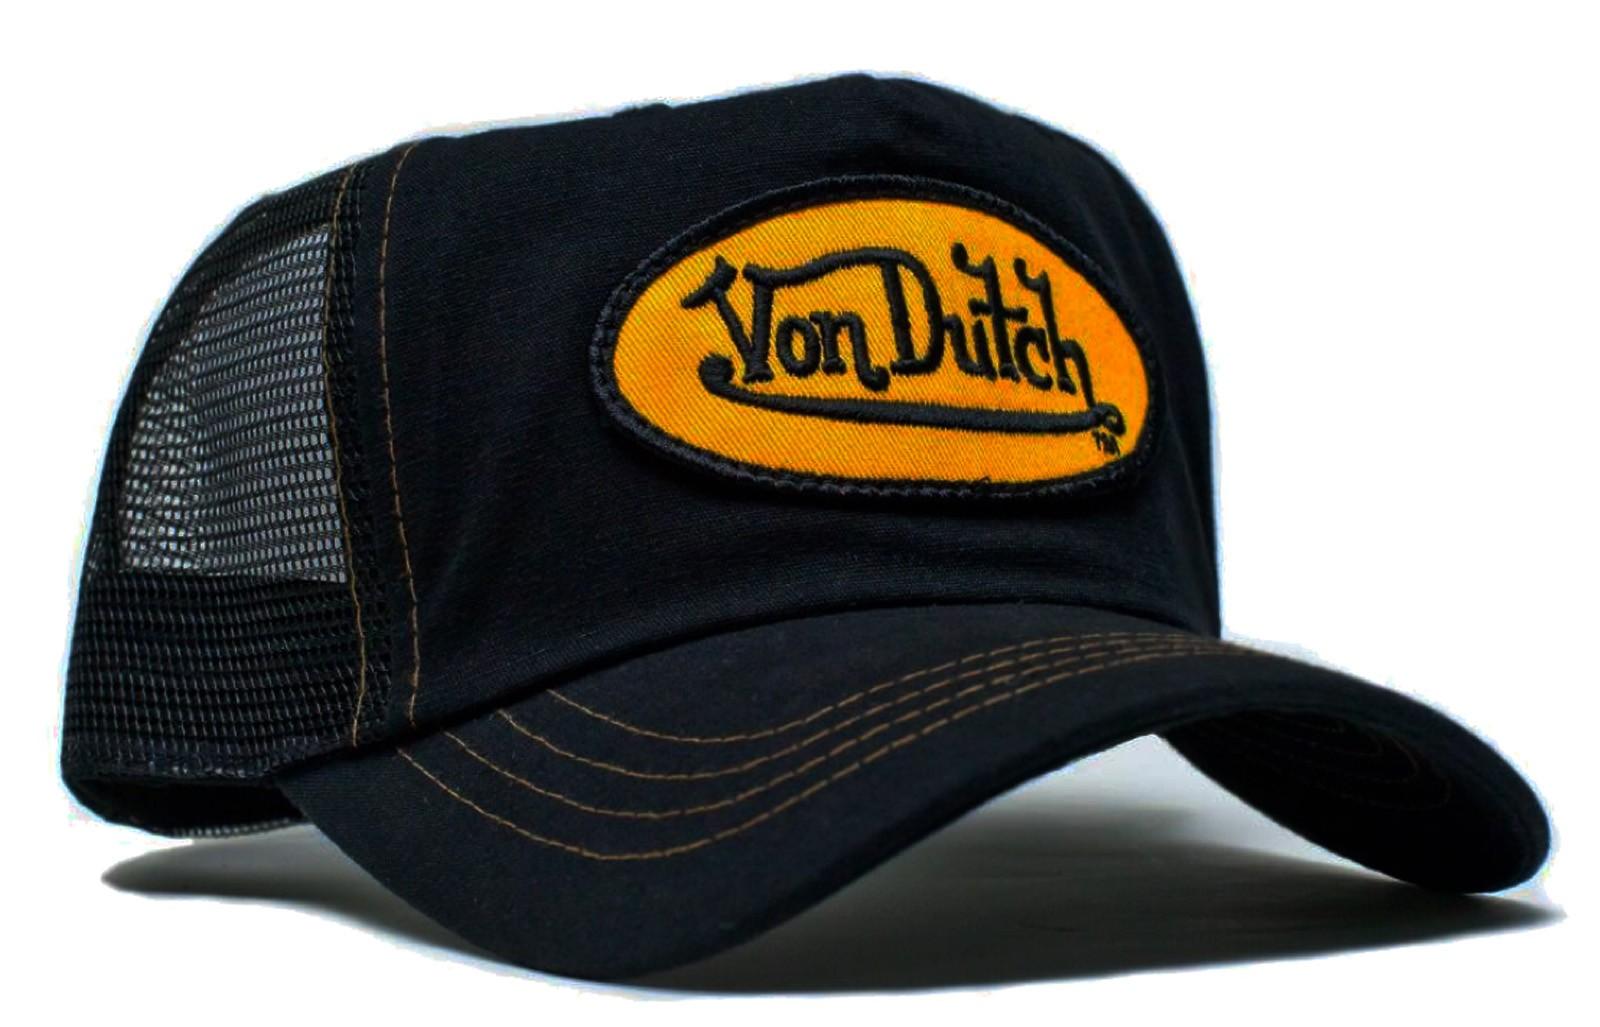 Von Dutch - Classic Black/Yellow Patch Mesh Trucker Cap